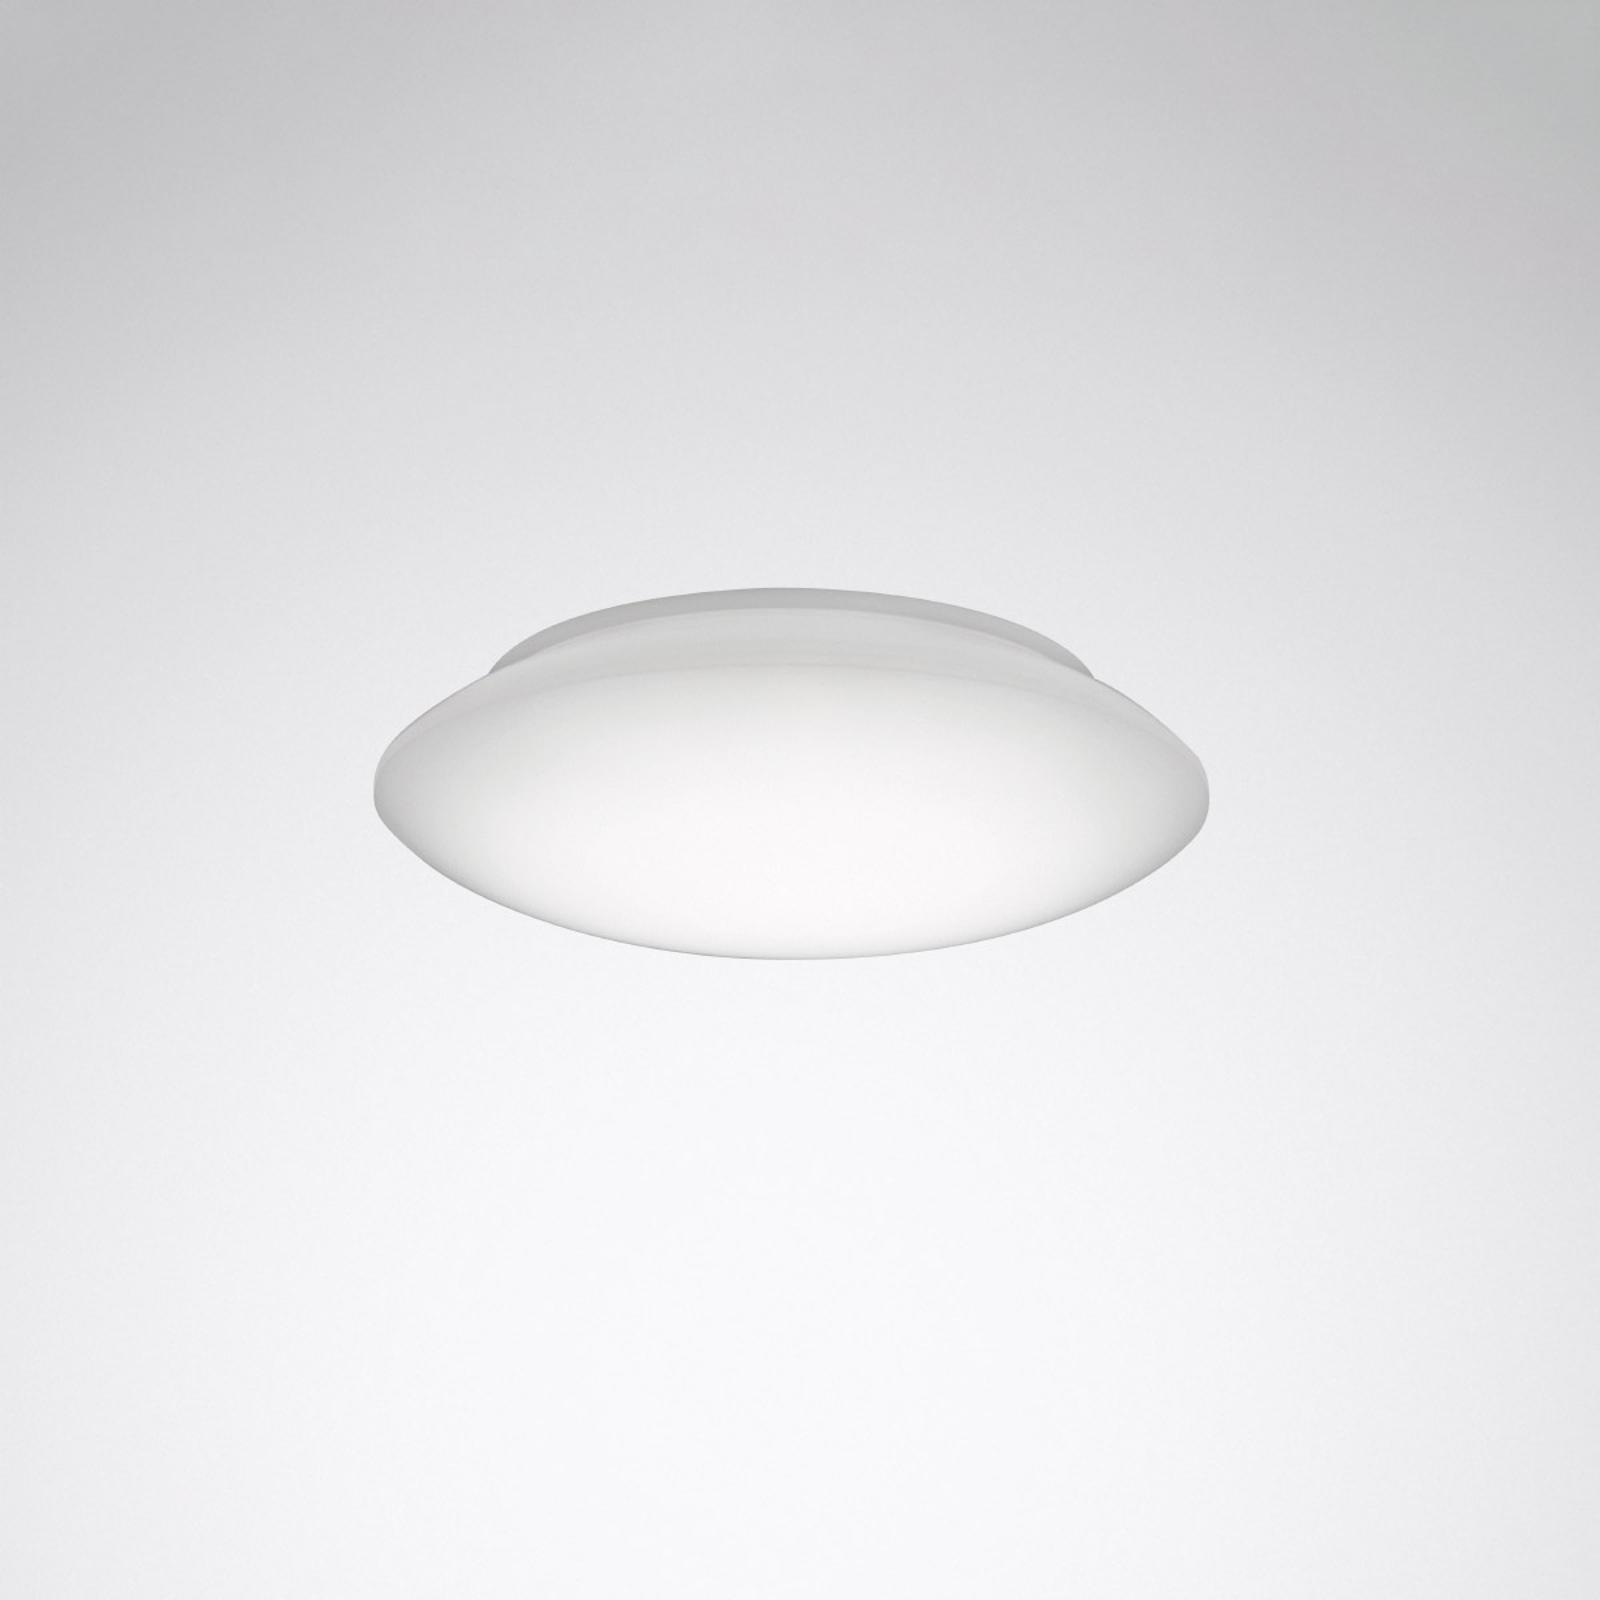 TRILUX 74R WD3 LED 3300 ET Deckenlampe